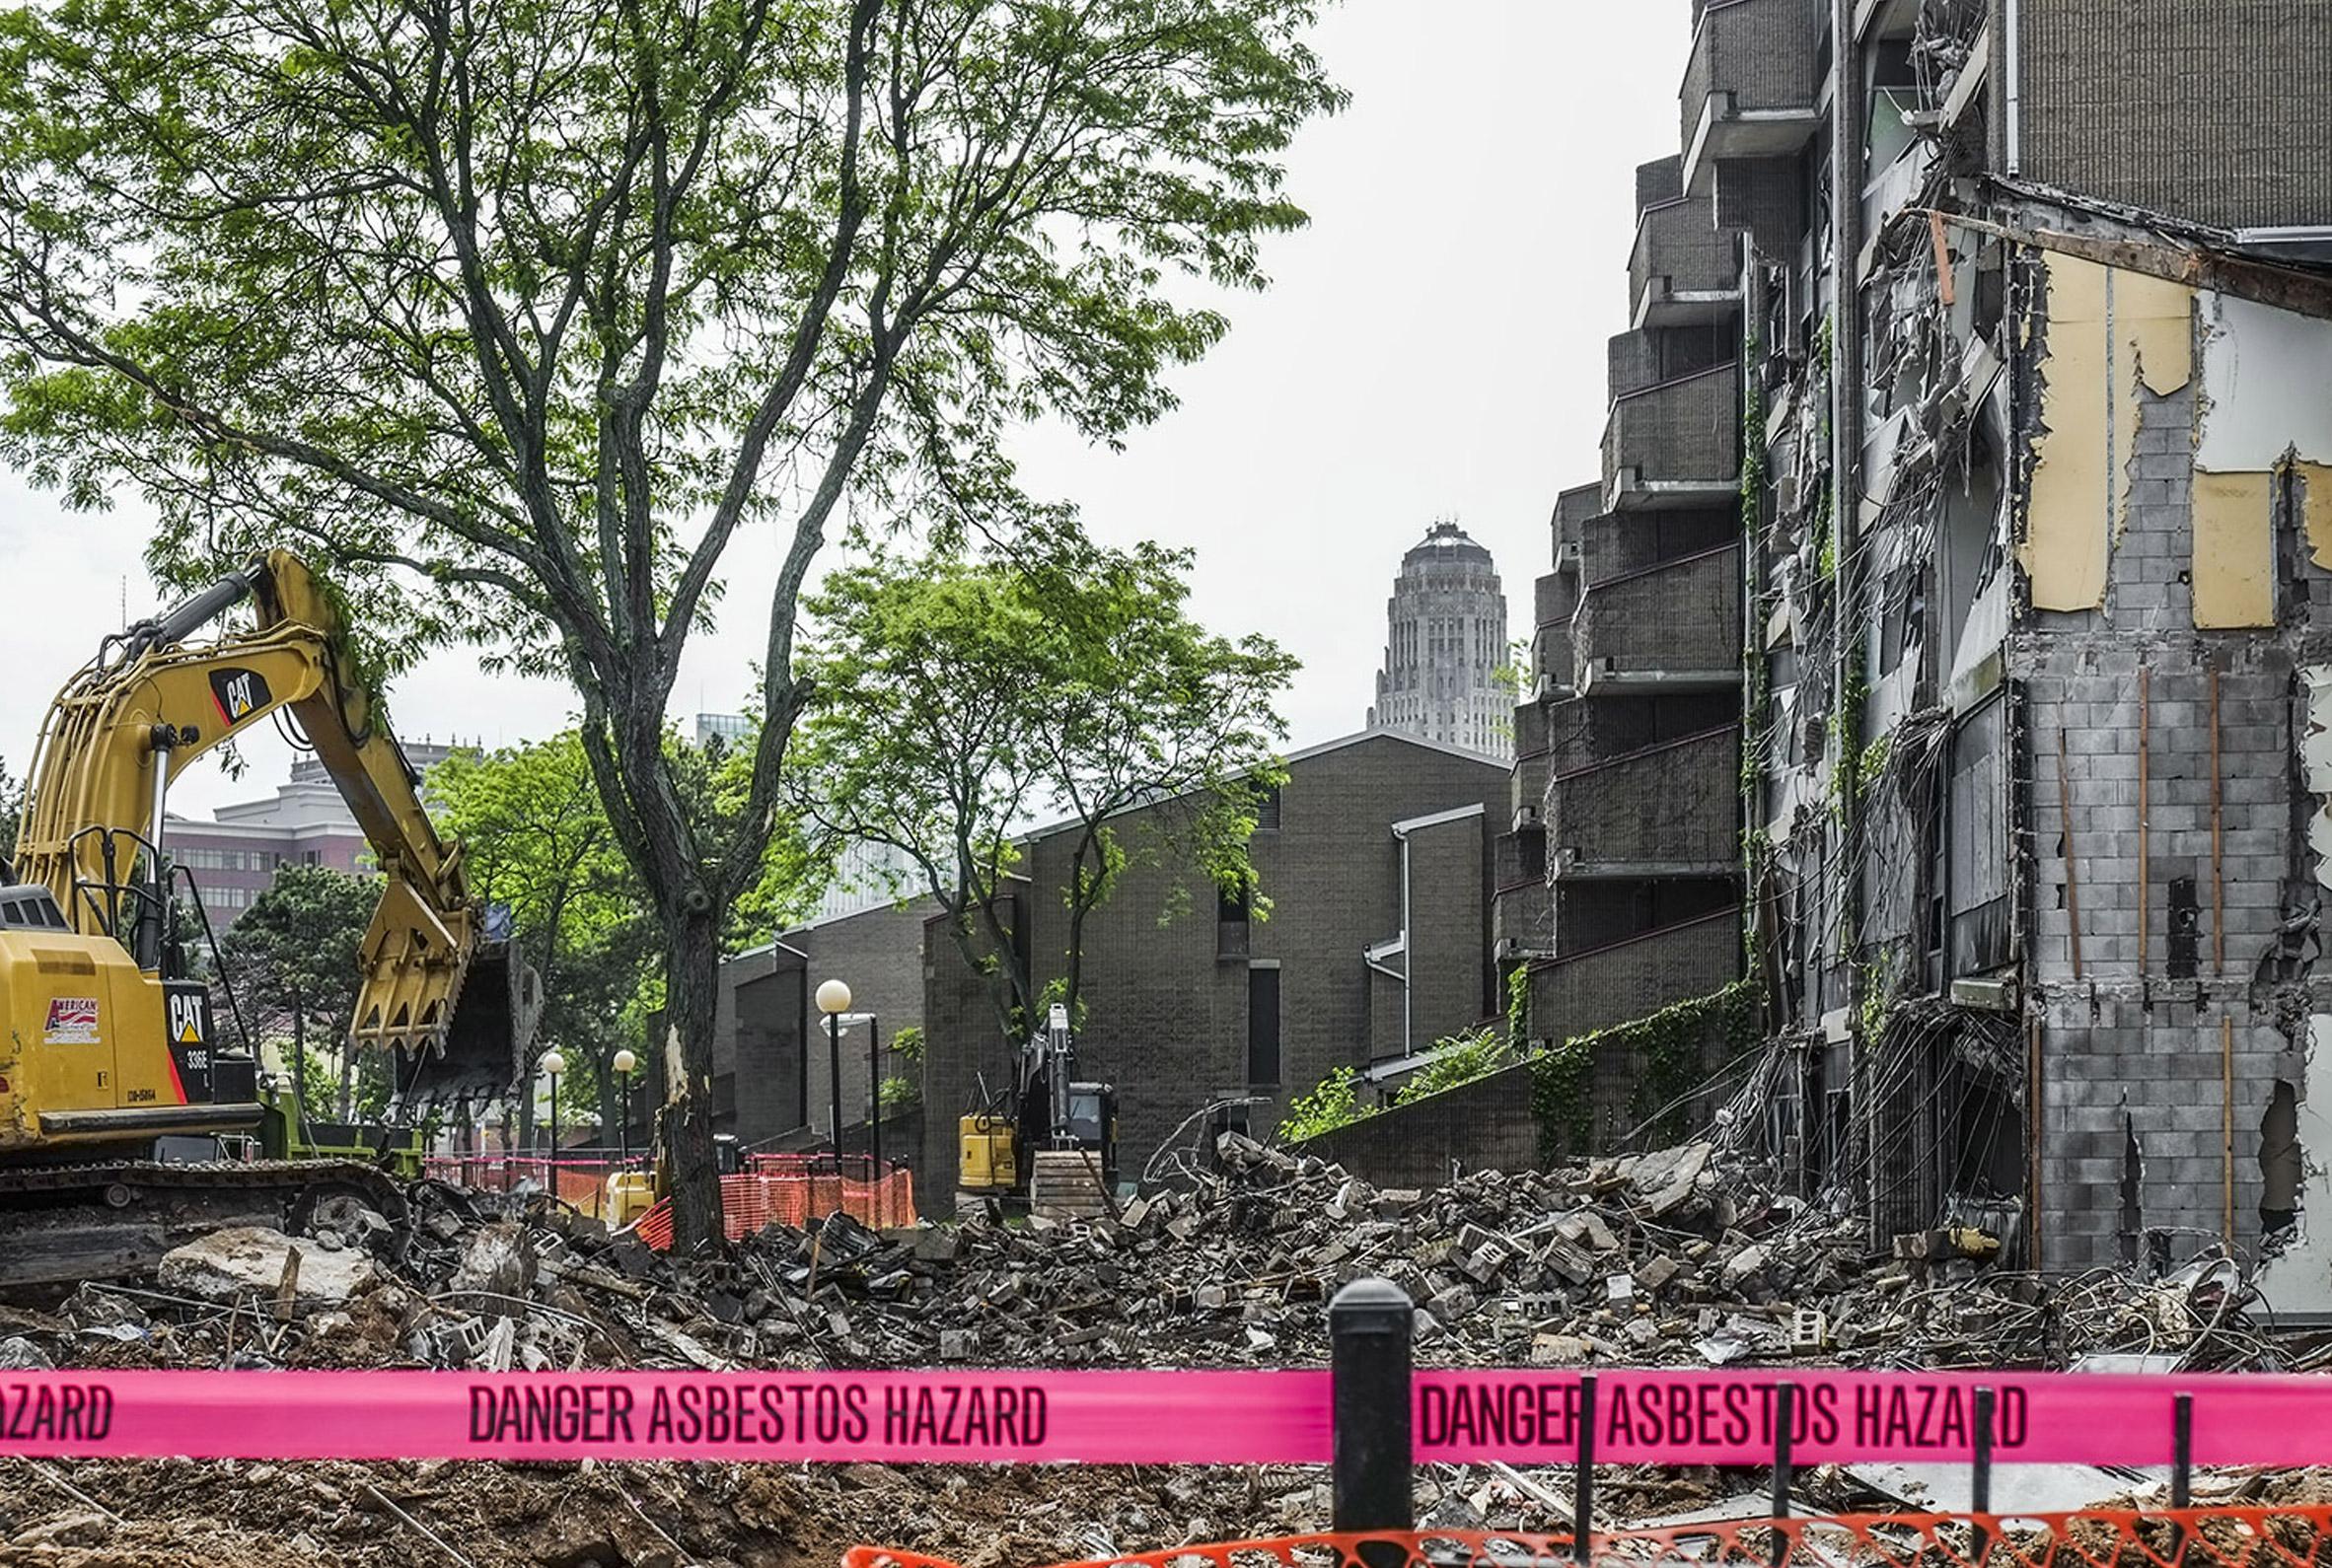 brutal-destruction-pinkcomma-gallery-architecture-photography-exhibit-boston-usa_dezeen_2364_col_4.jpg